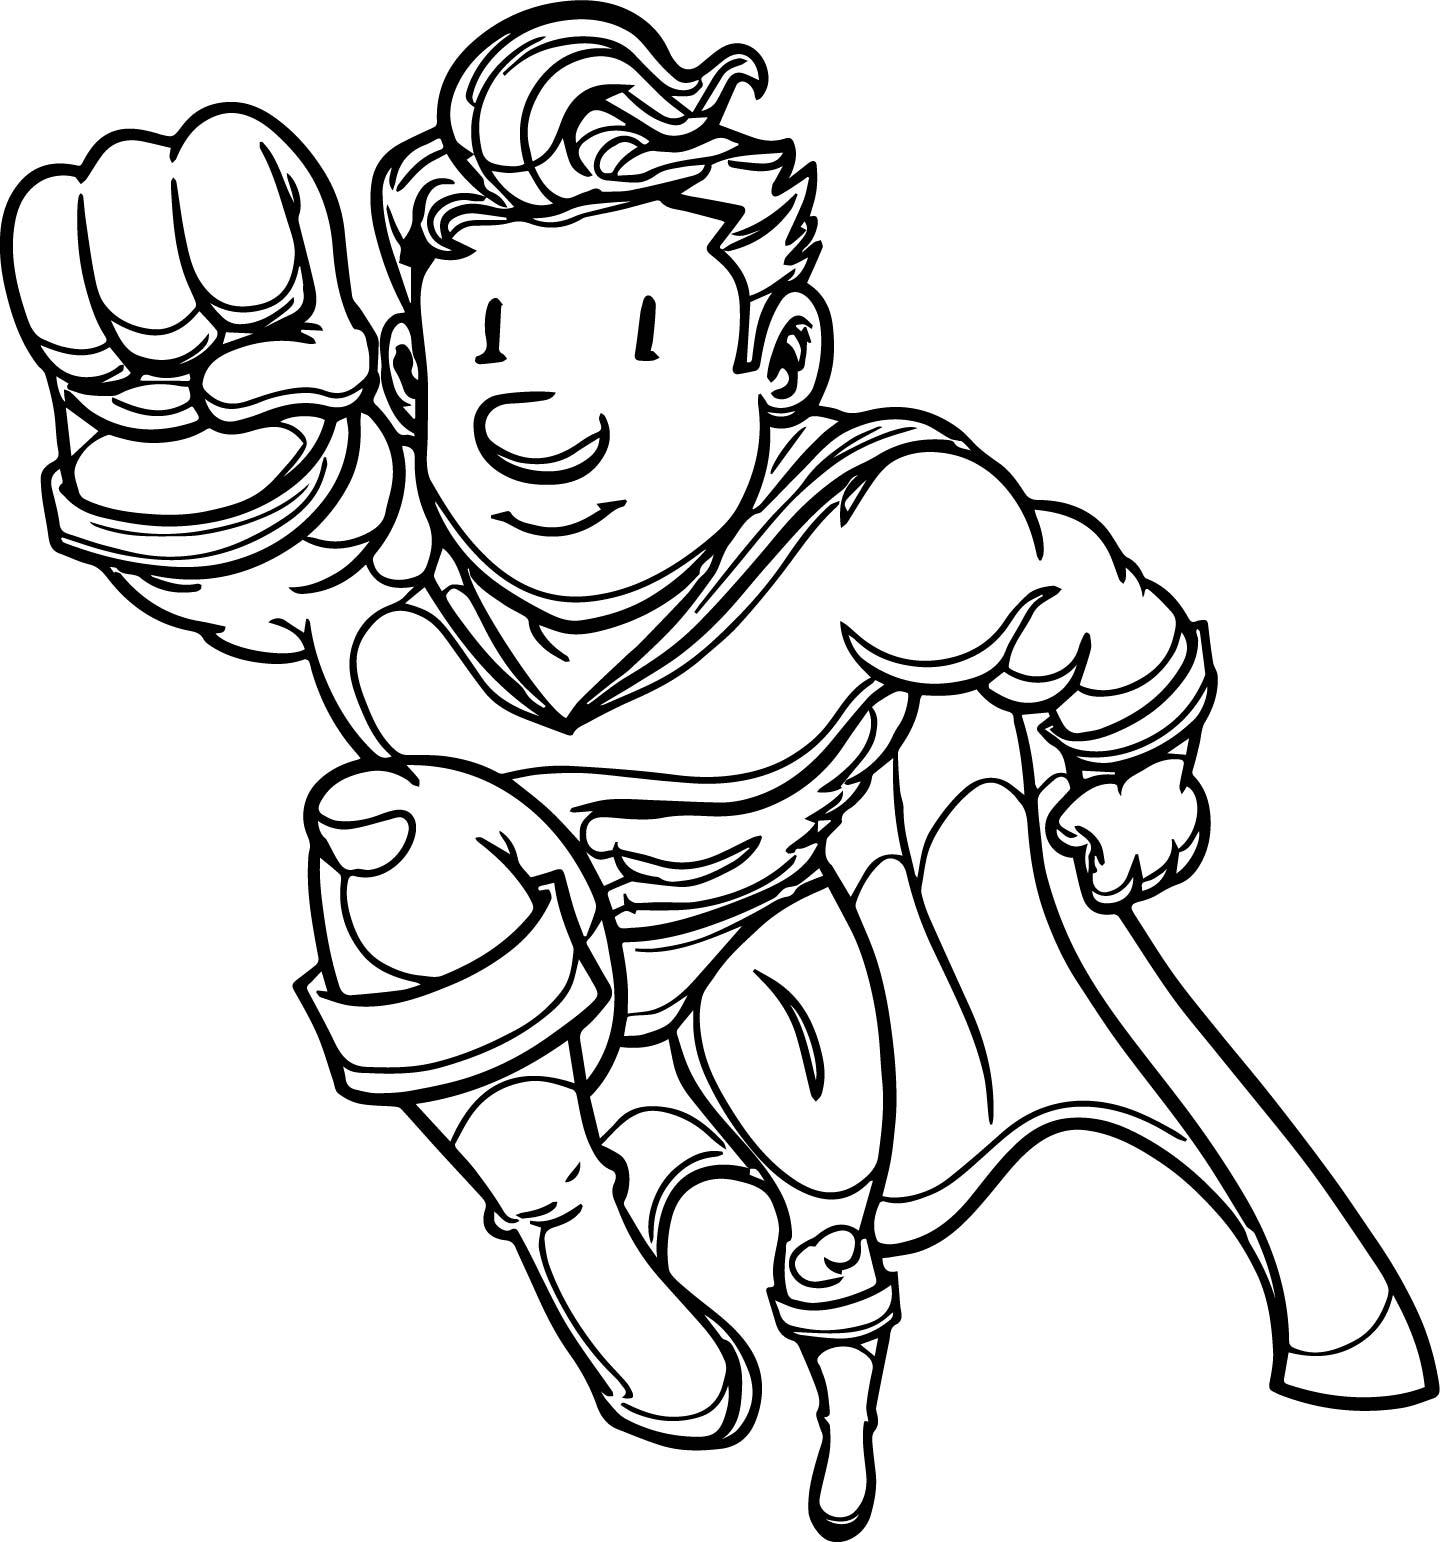 Good Superheroes Man Super Hero Coloring Page